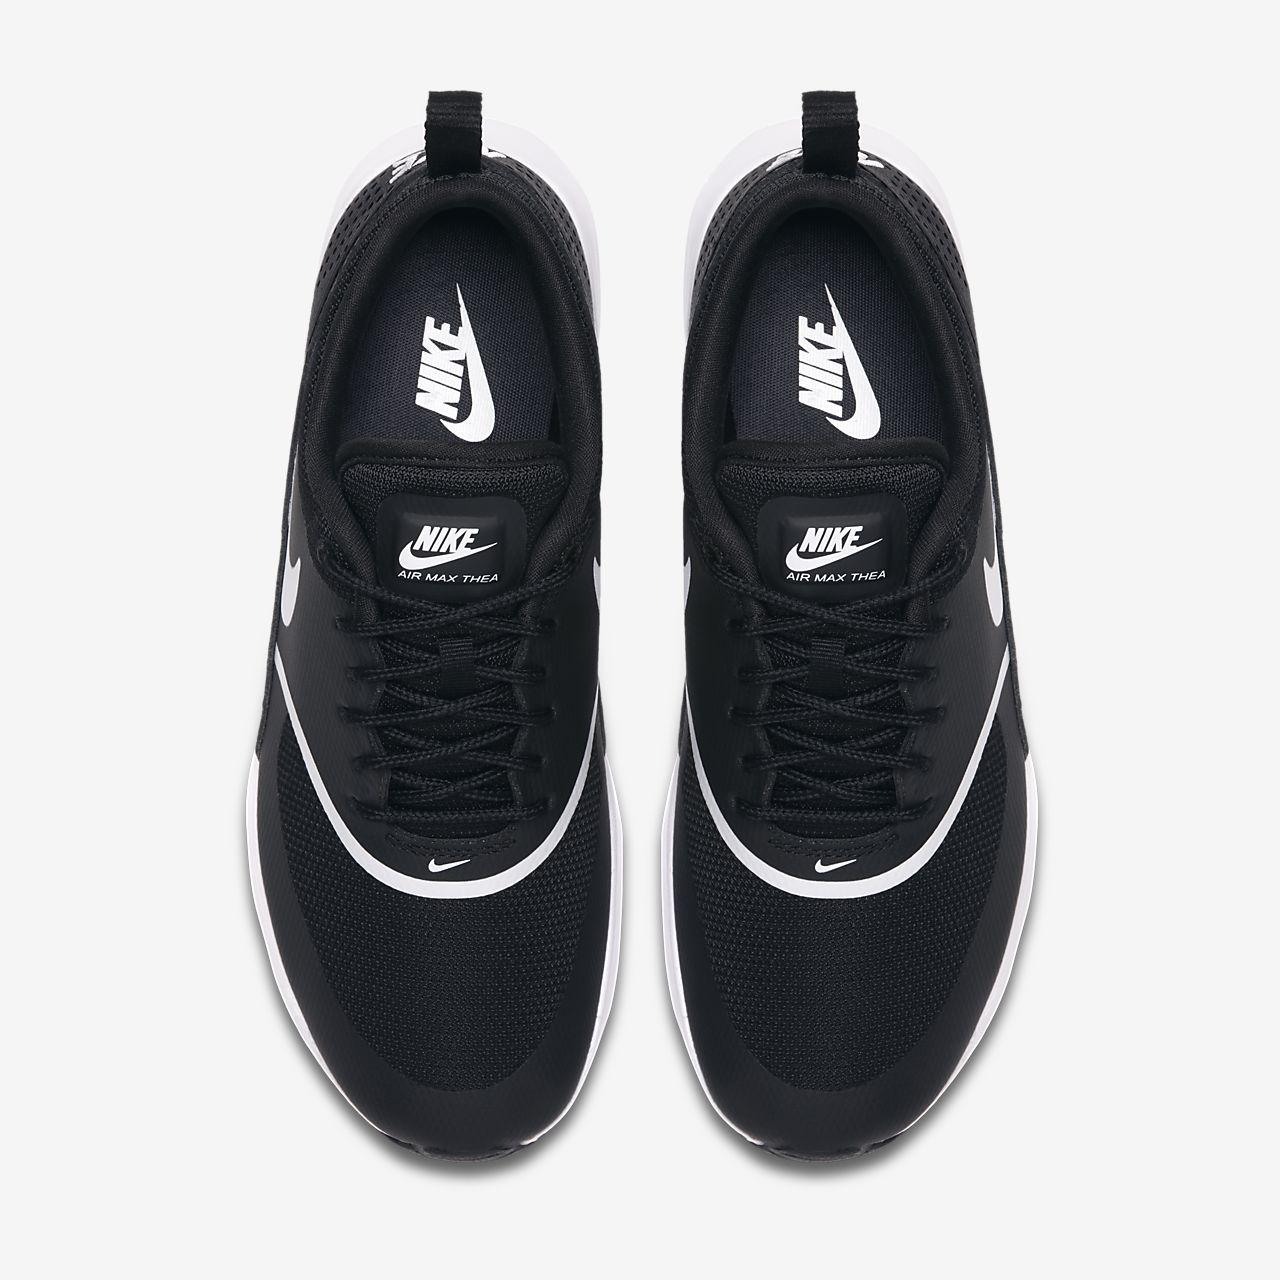 sports shoes fbf5d b4f6c ... Chaussure Nike Air Max Thea pour Femme